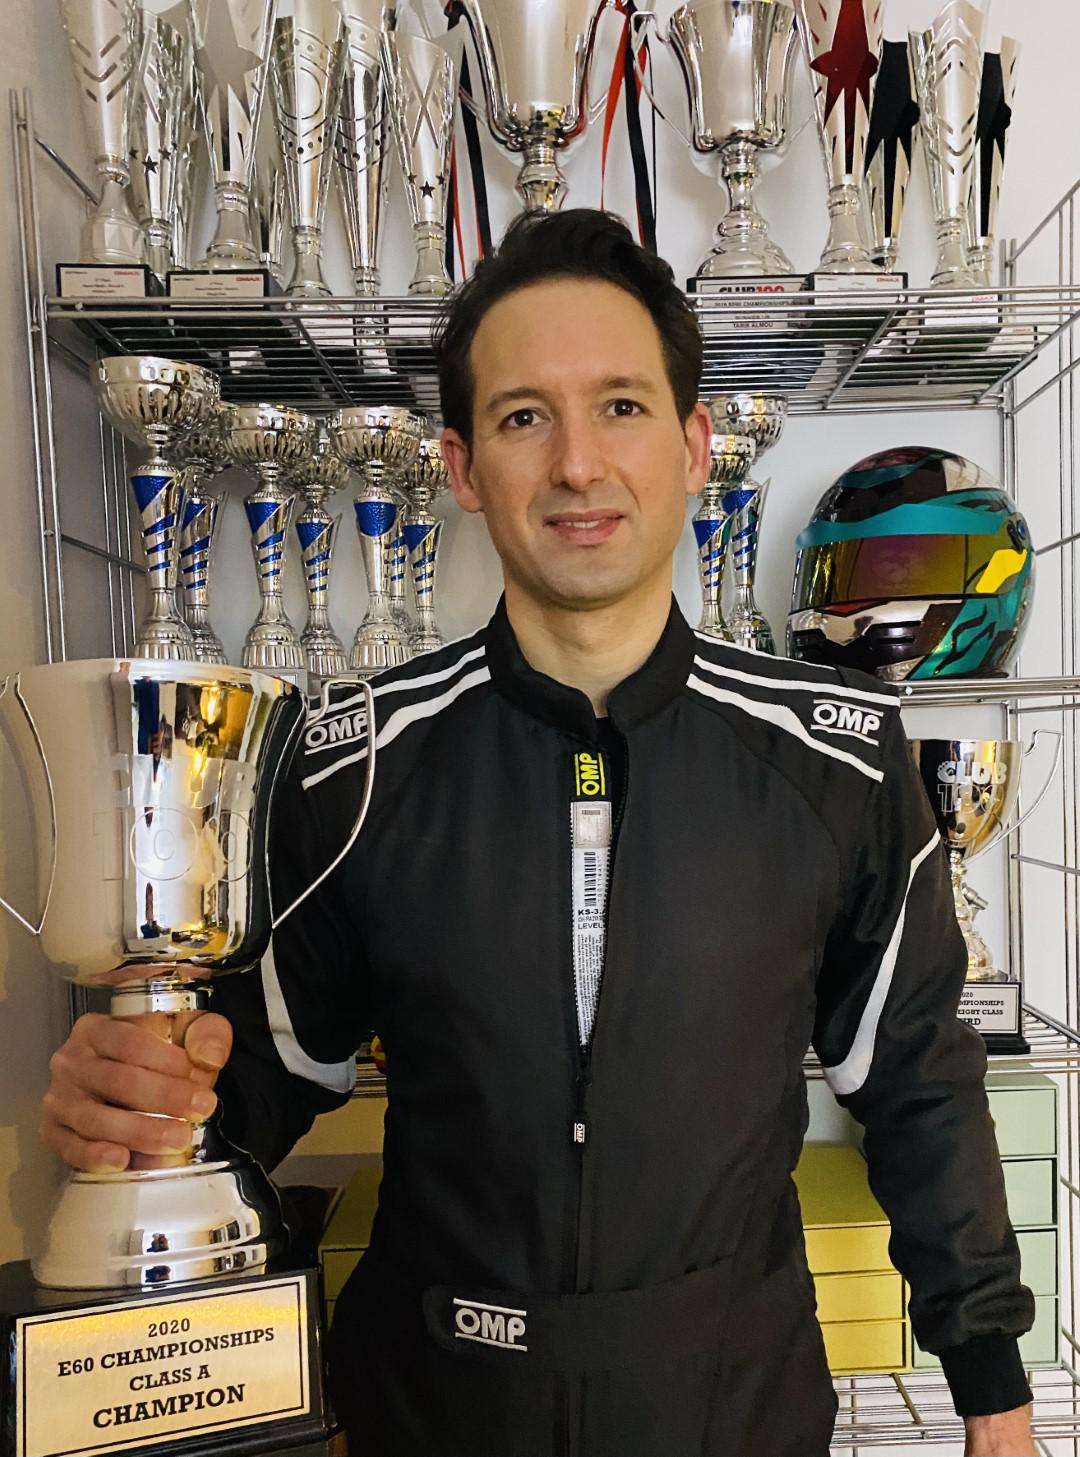 qui-est-ce-marocain-champion-de-karting-en-angleterre-1410-2.jpg